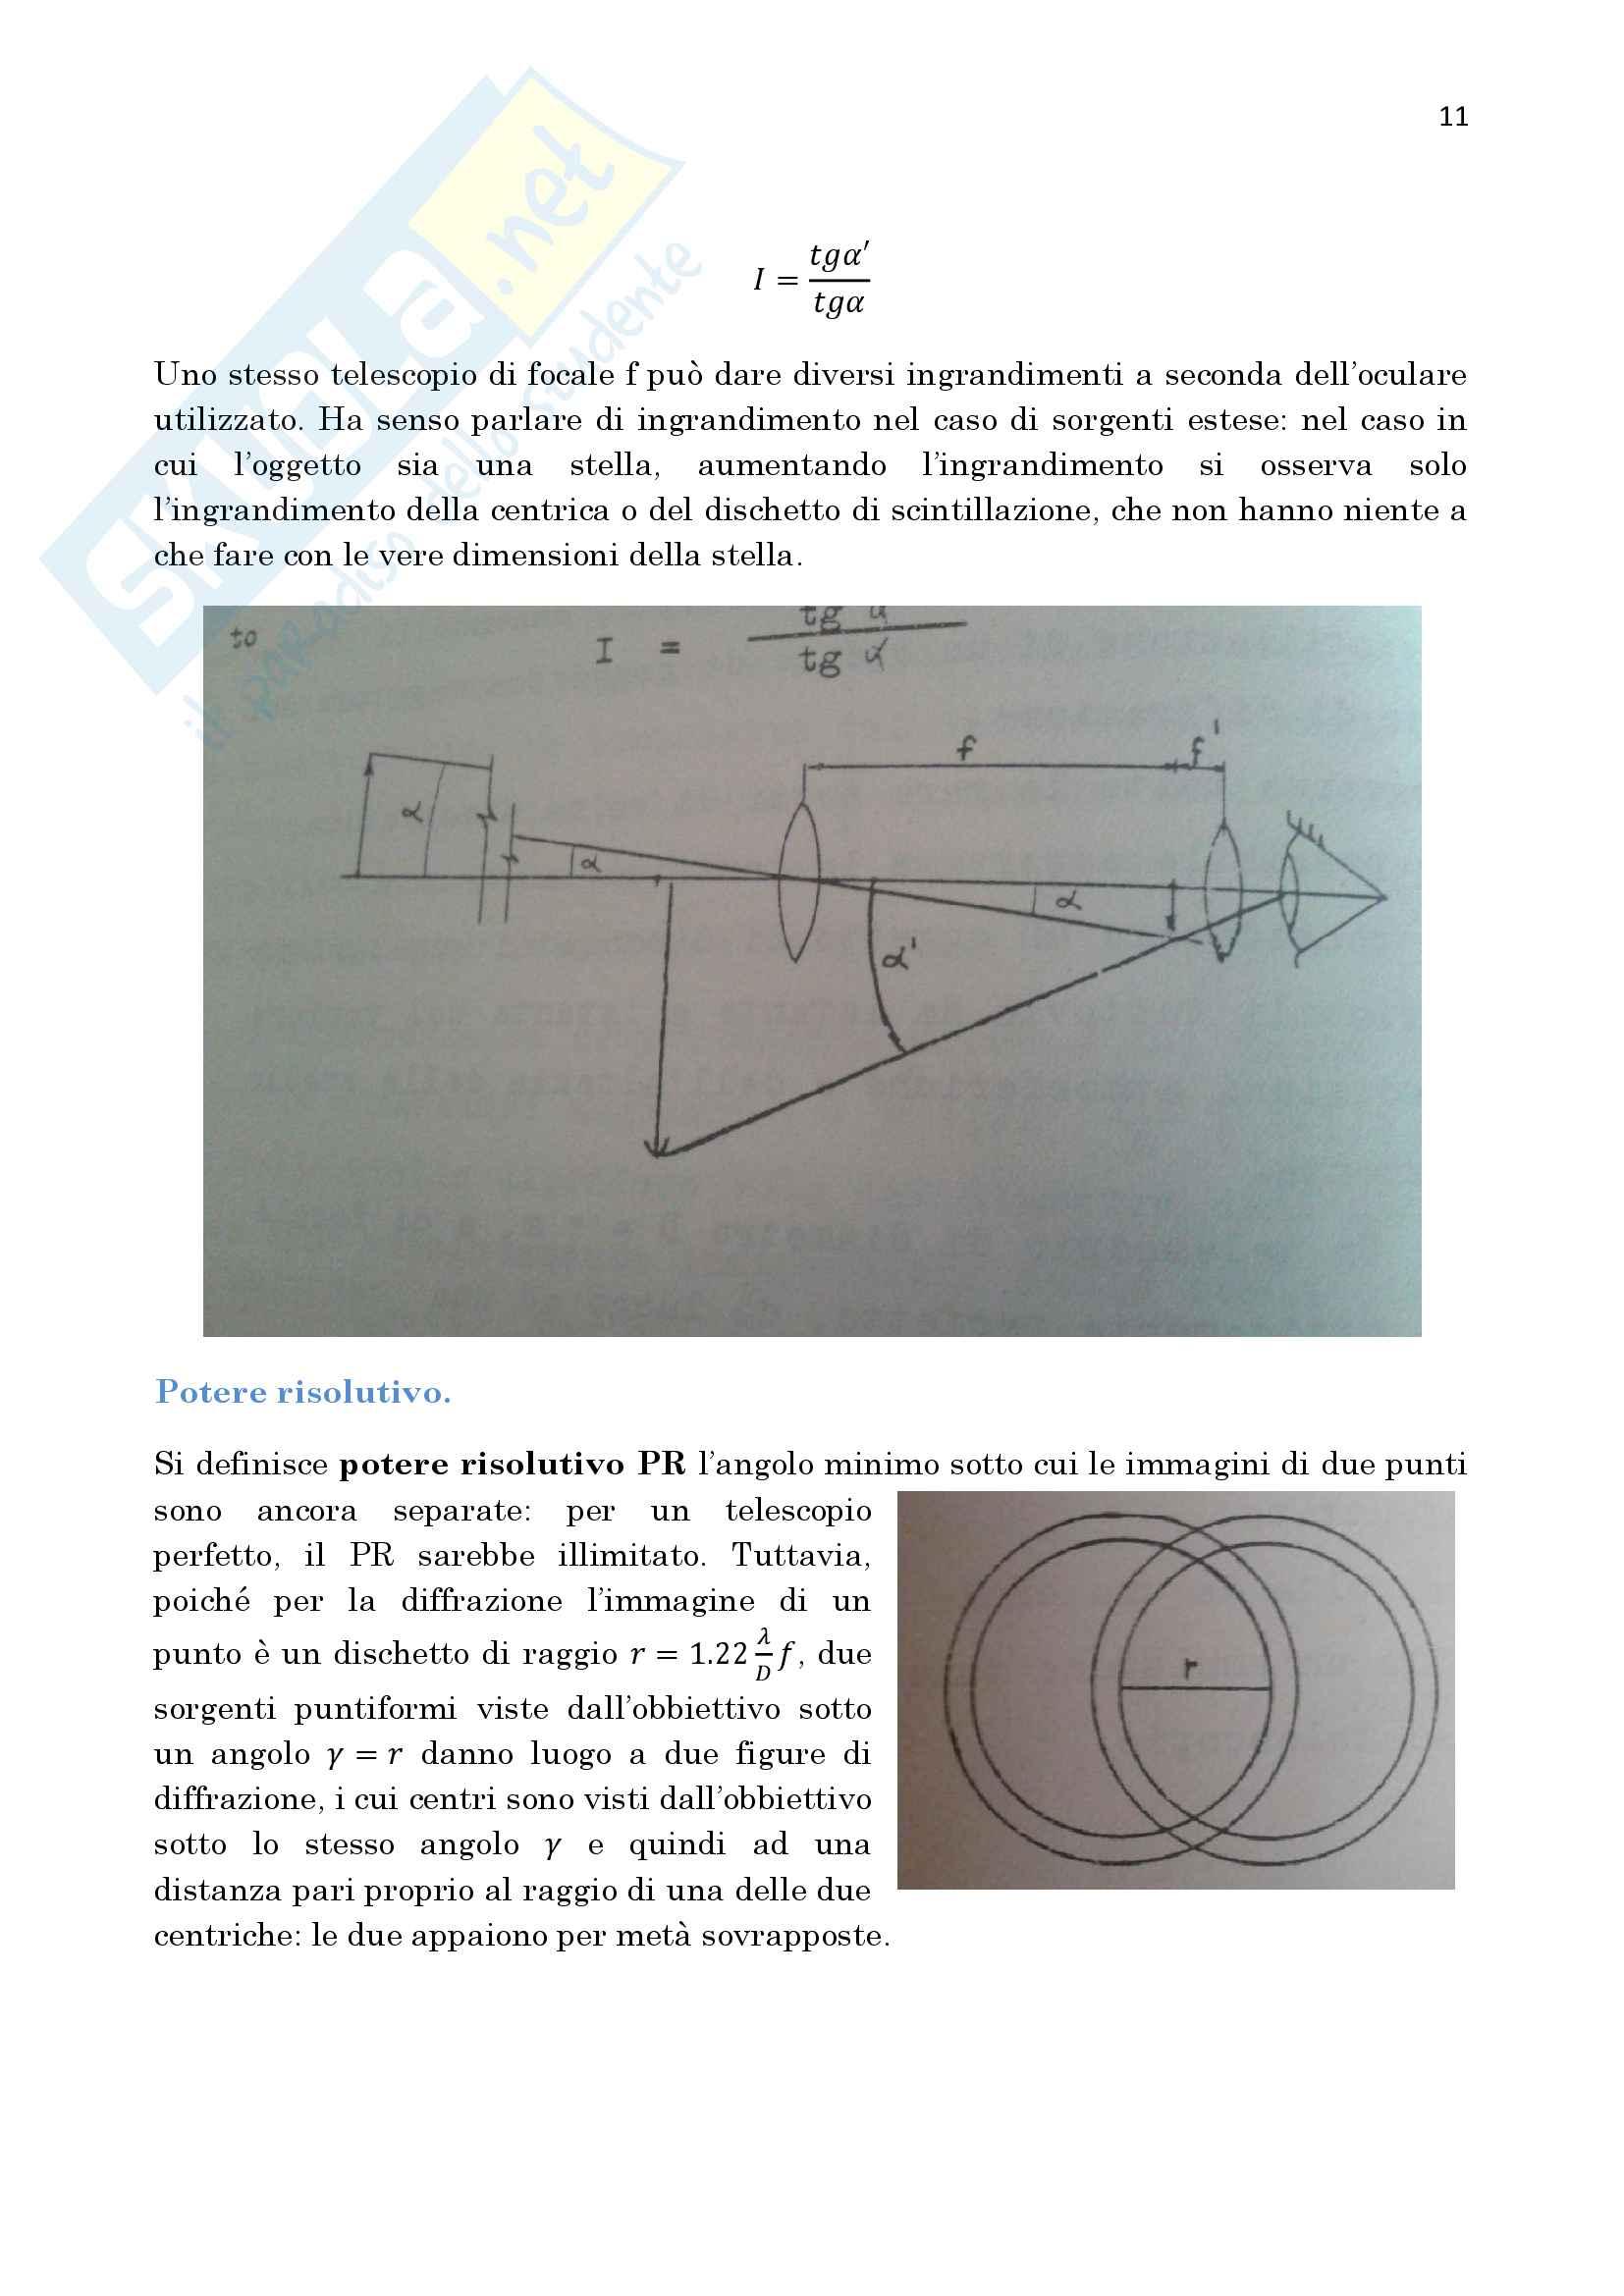 Astronomia Pag. 11